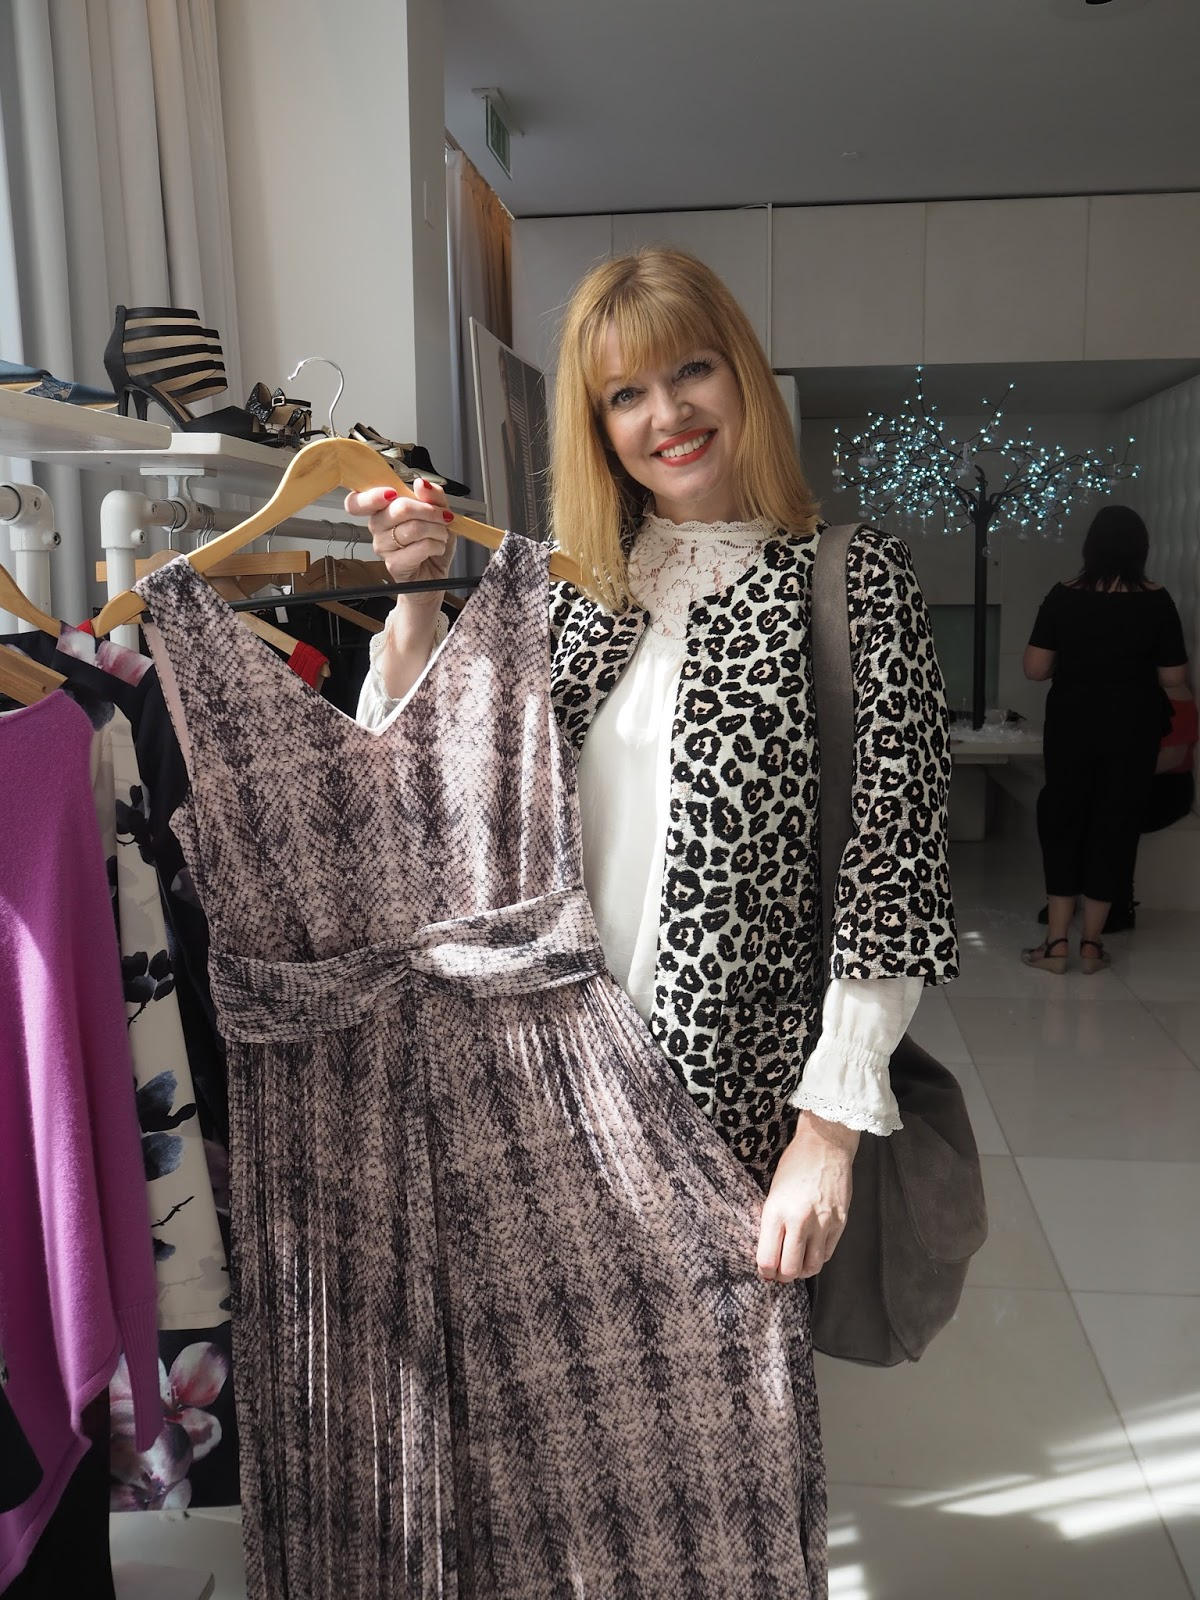 What-Lizzy-Loves-Kaleidoscope-AW17_Press-Day-Snakeprint-maxi-dress